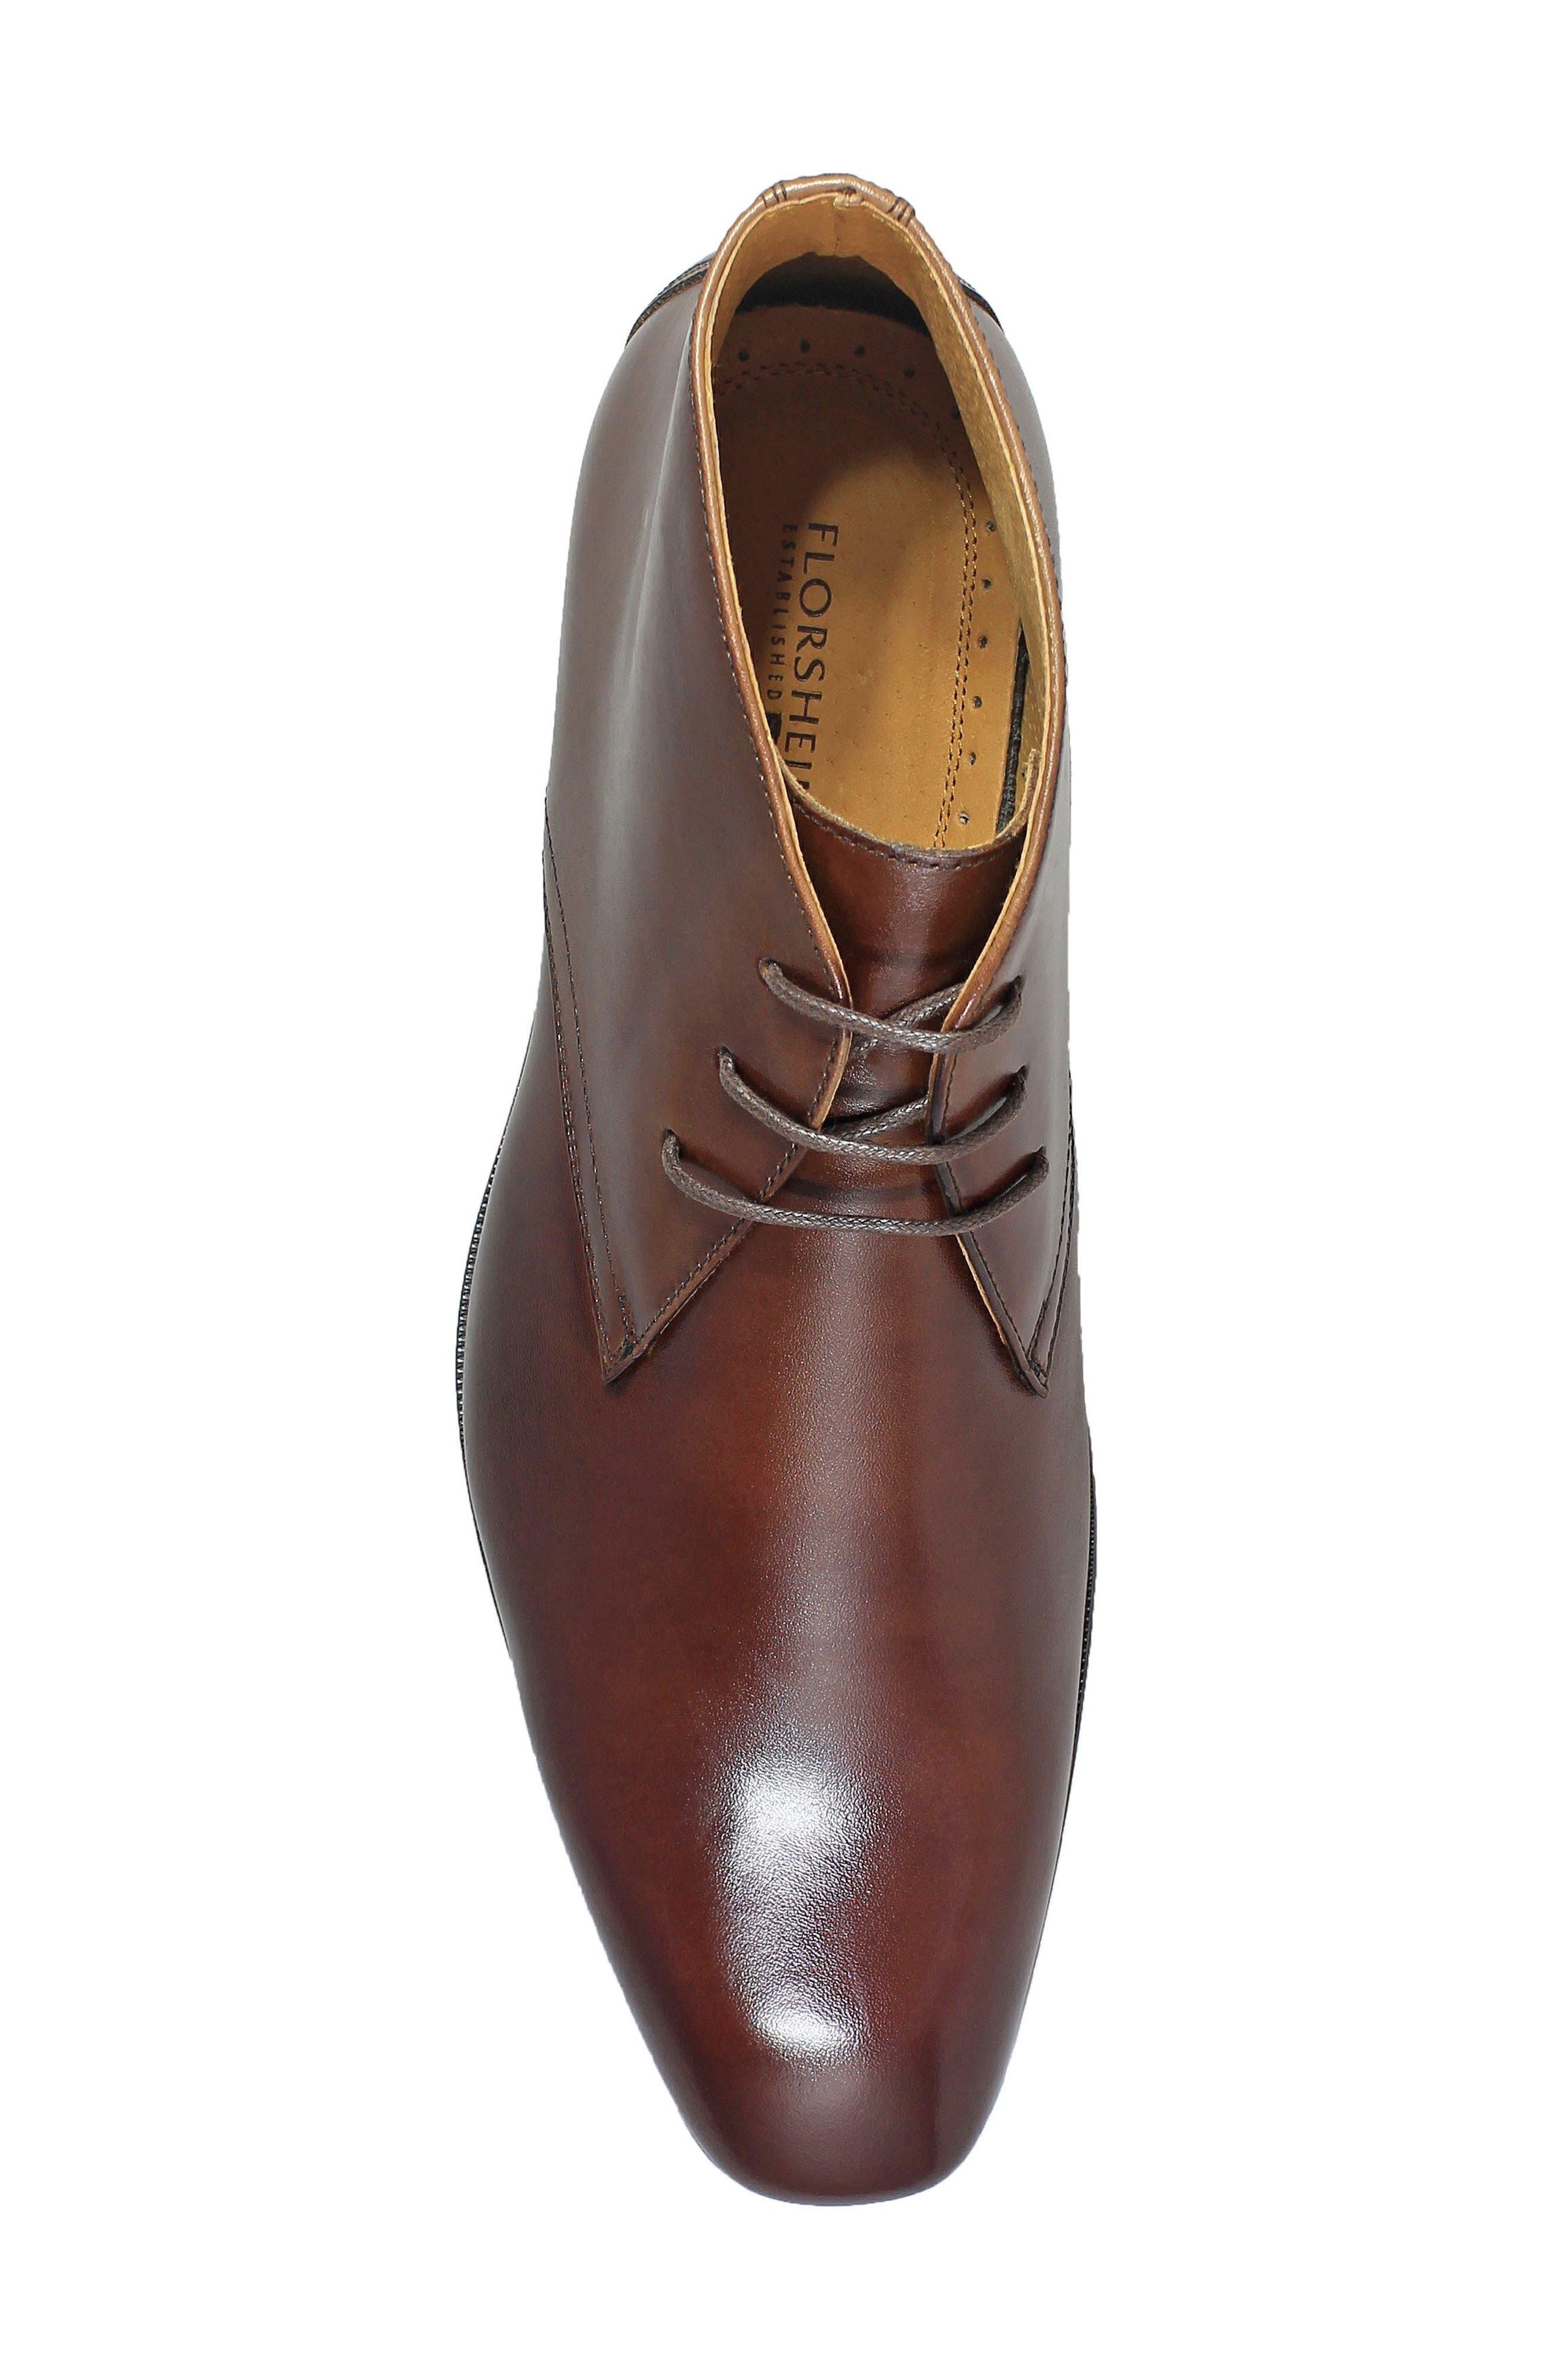 Corbetta Chukka Boot,                             Alternate thumbnail 5, color,                             Cognac Leather